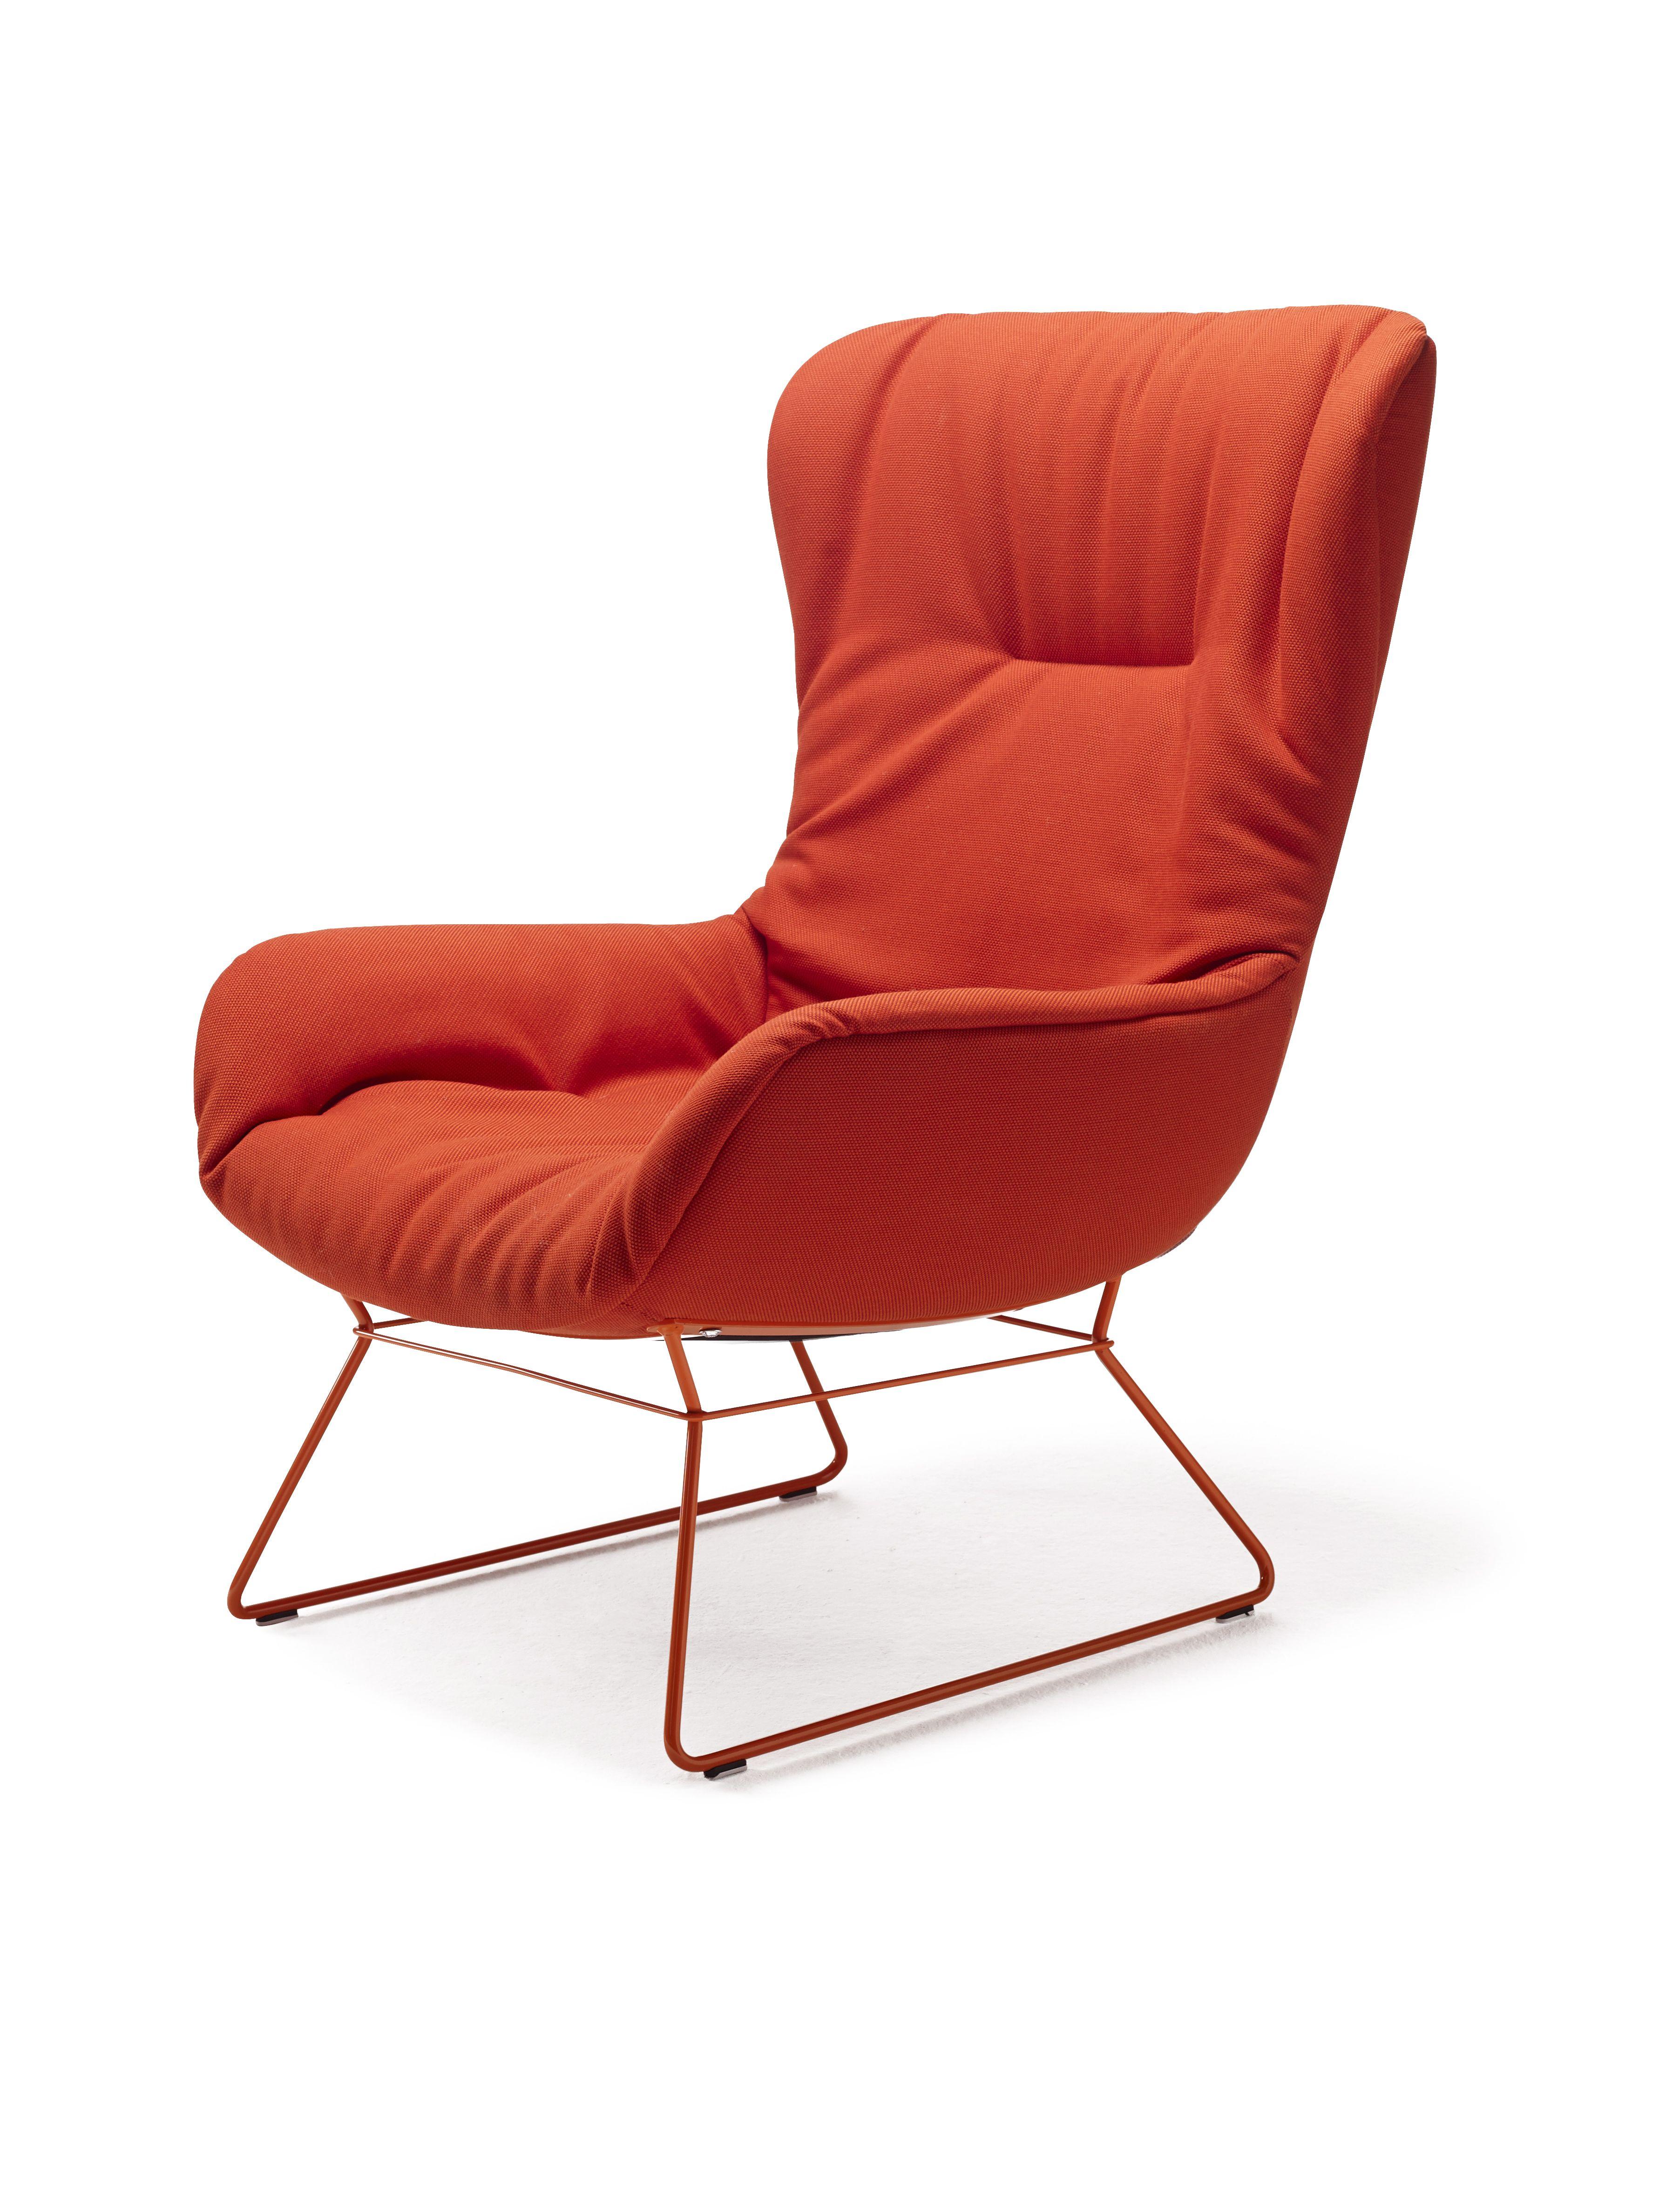 Leya wingback chair bright red design by birgit